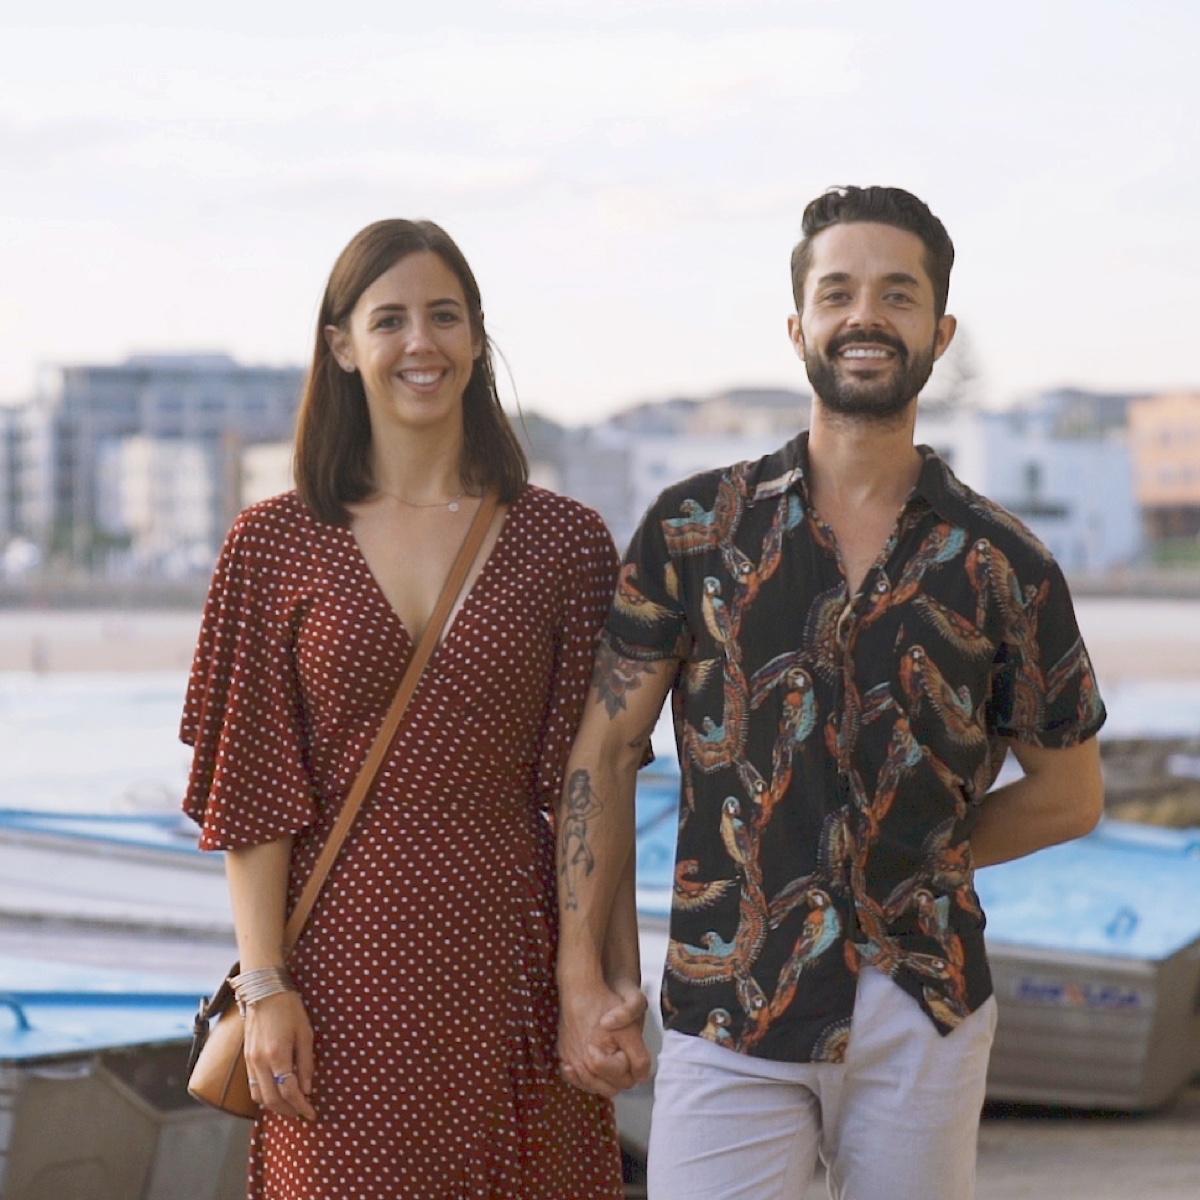 young-couple-skincare-ethical-branding-designer-webdesign-byron-sydney-melbourne.jpg